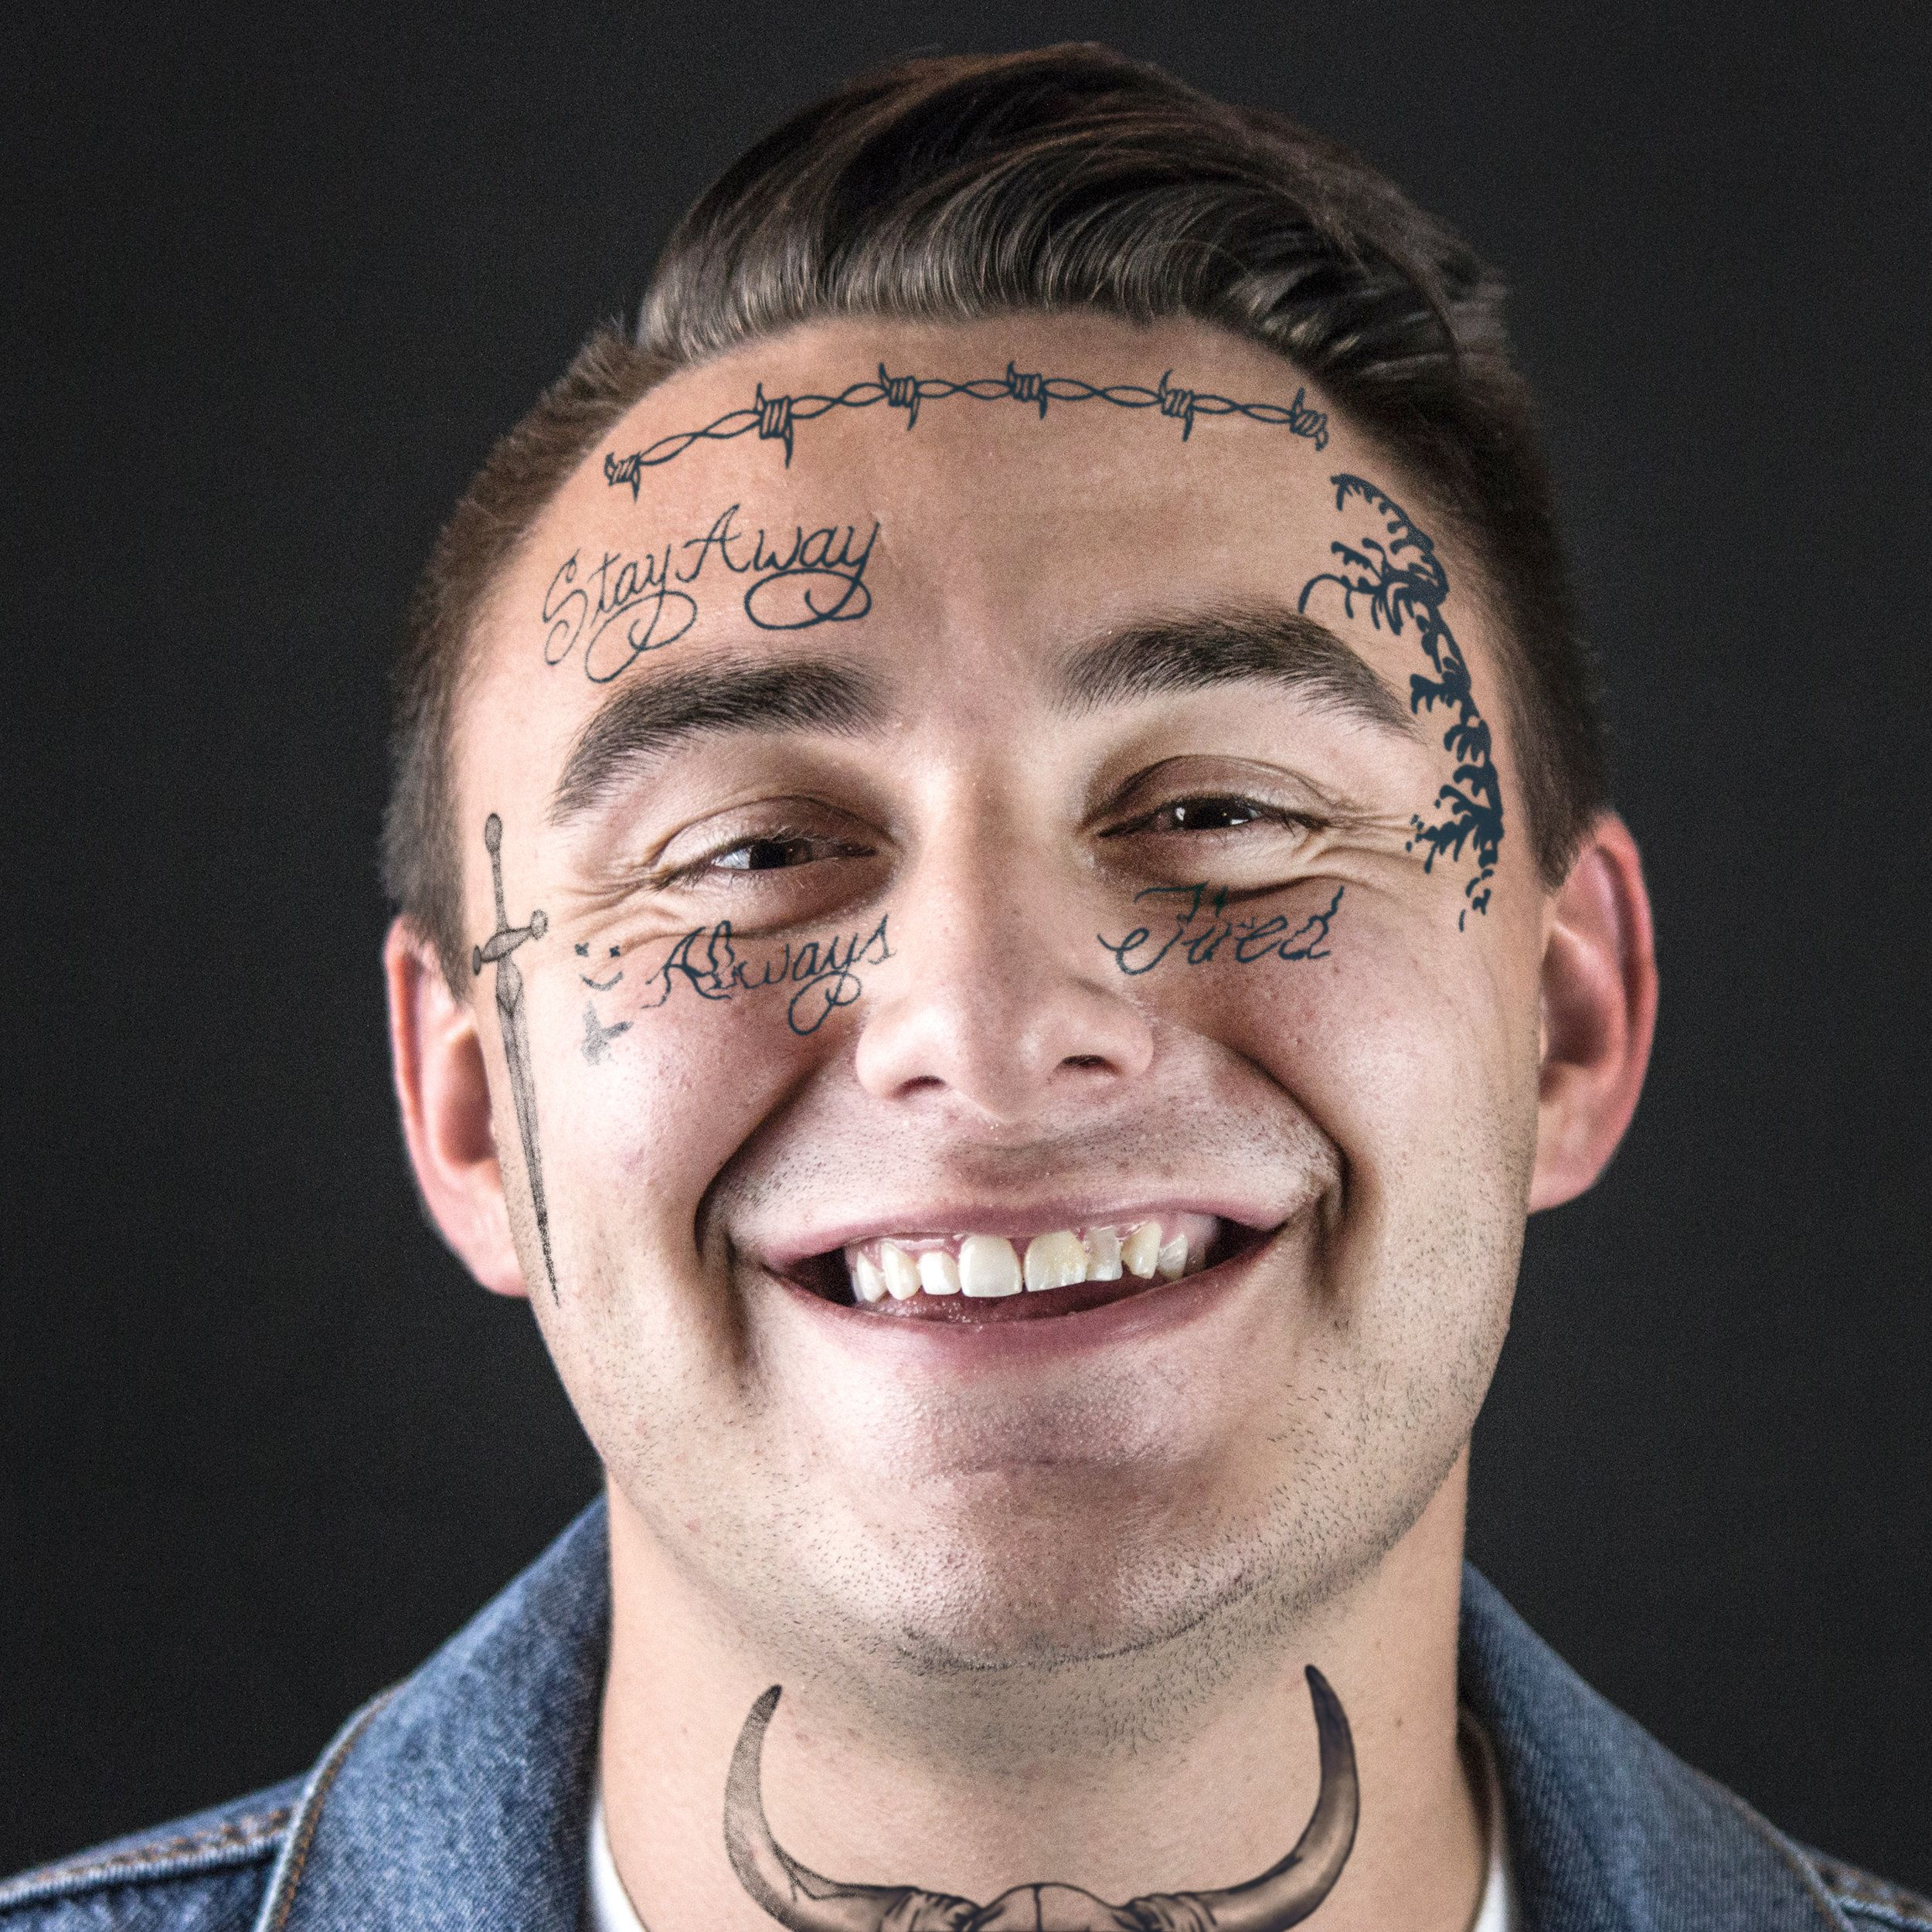 post malone face tattoo set | halloween temporary tattoos | halloween costume | skin safe | 16